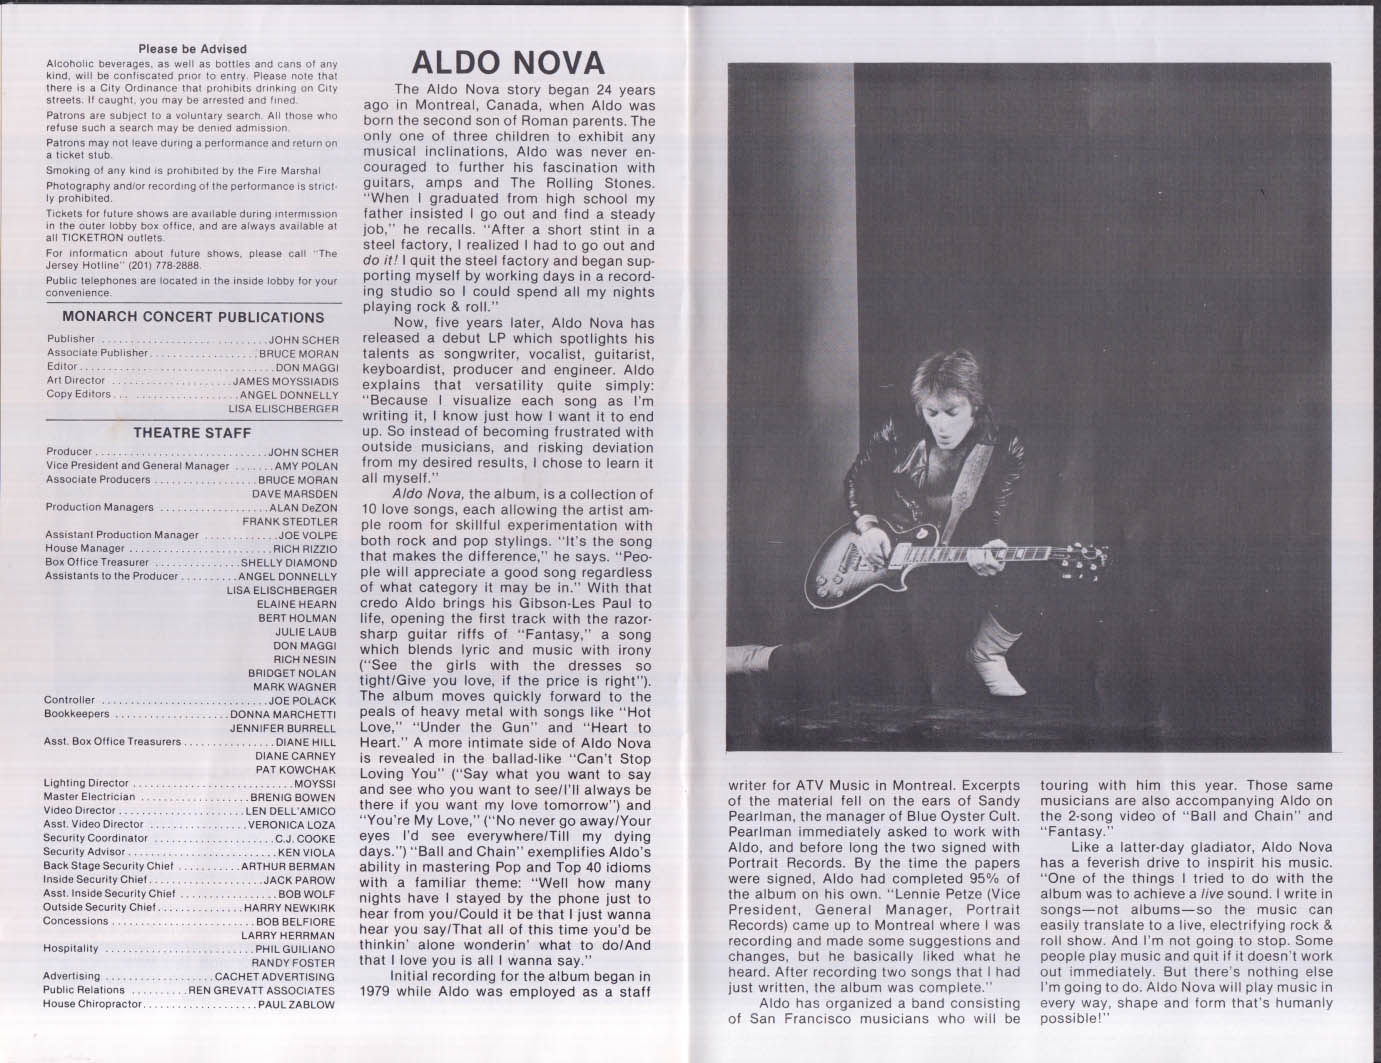 Blue Oyster Cult & Aldo Nova Asbury Park On the Boardwalk program 1982